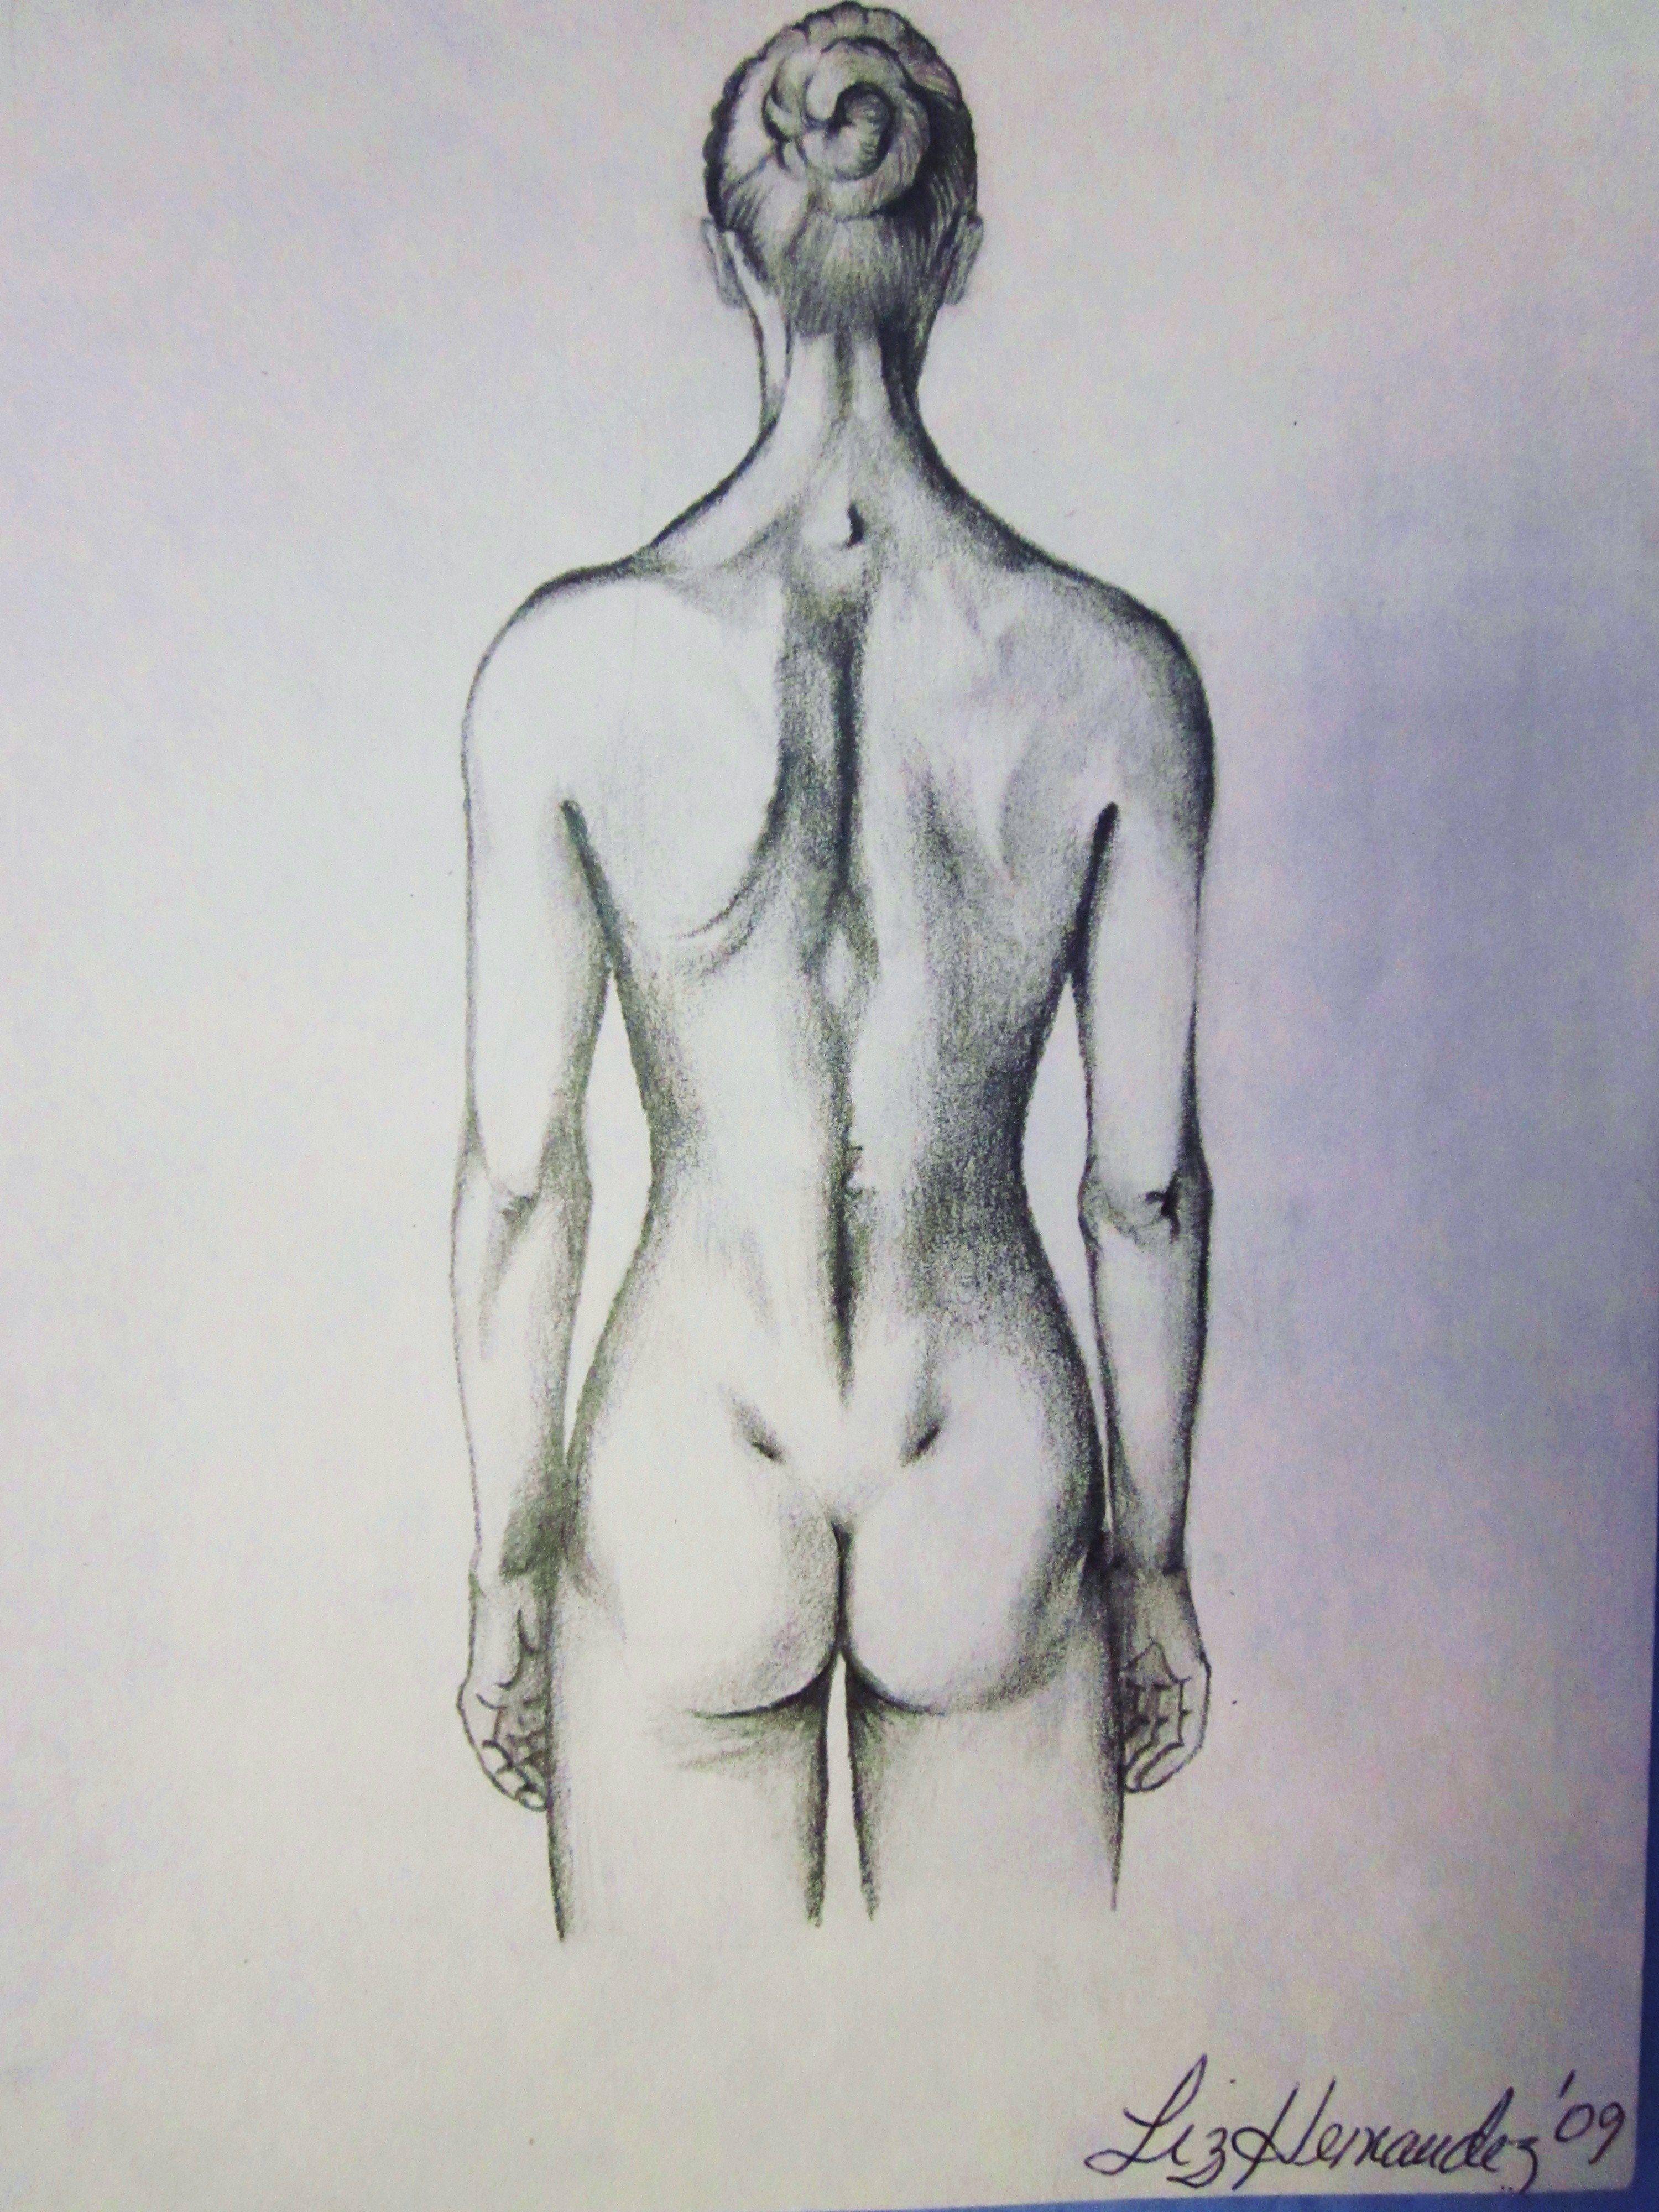 Espalda De Mujer Wwwlizhernandezartecom Aprendiendo A Dibujar